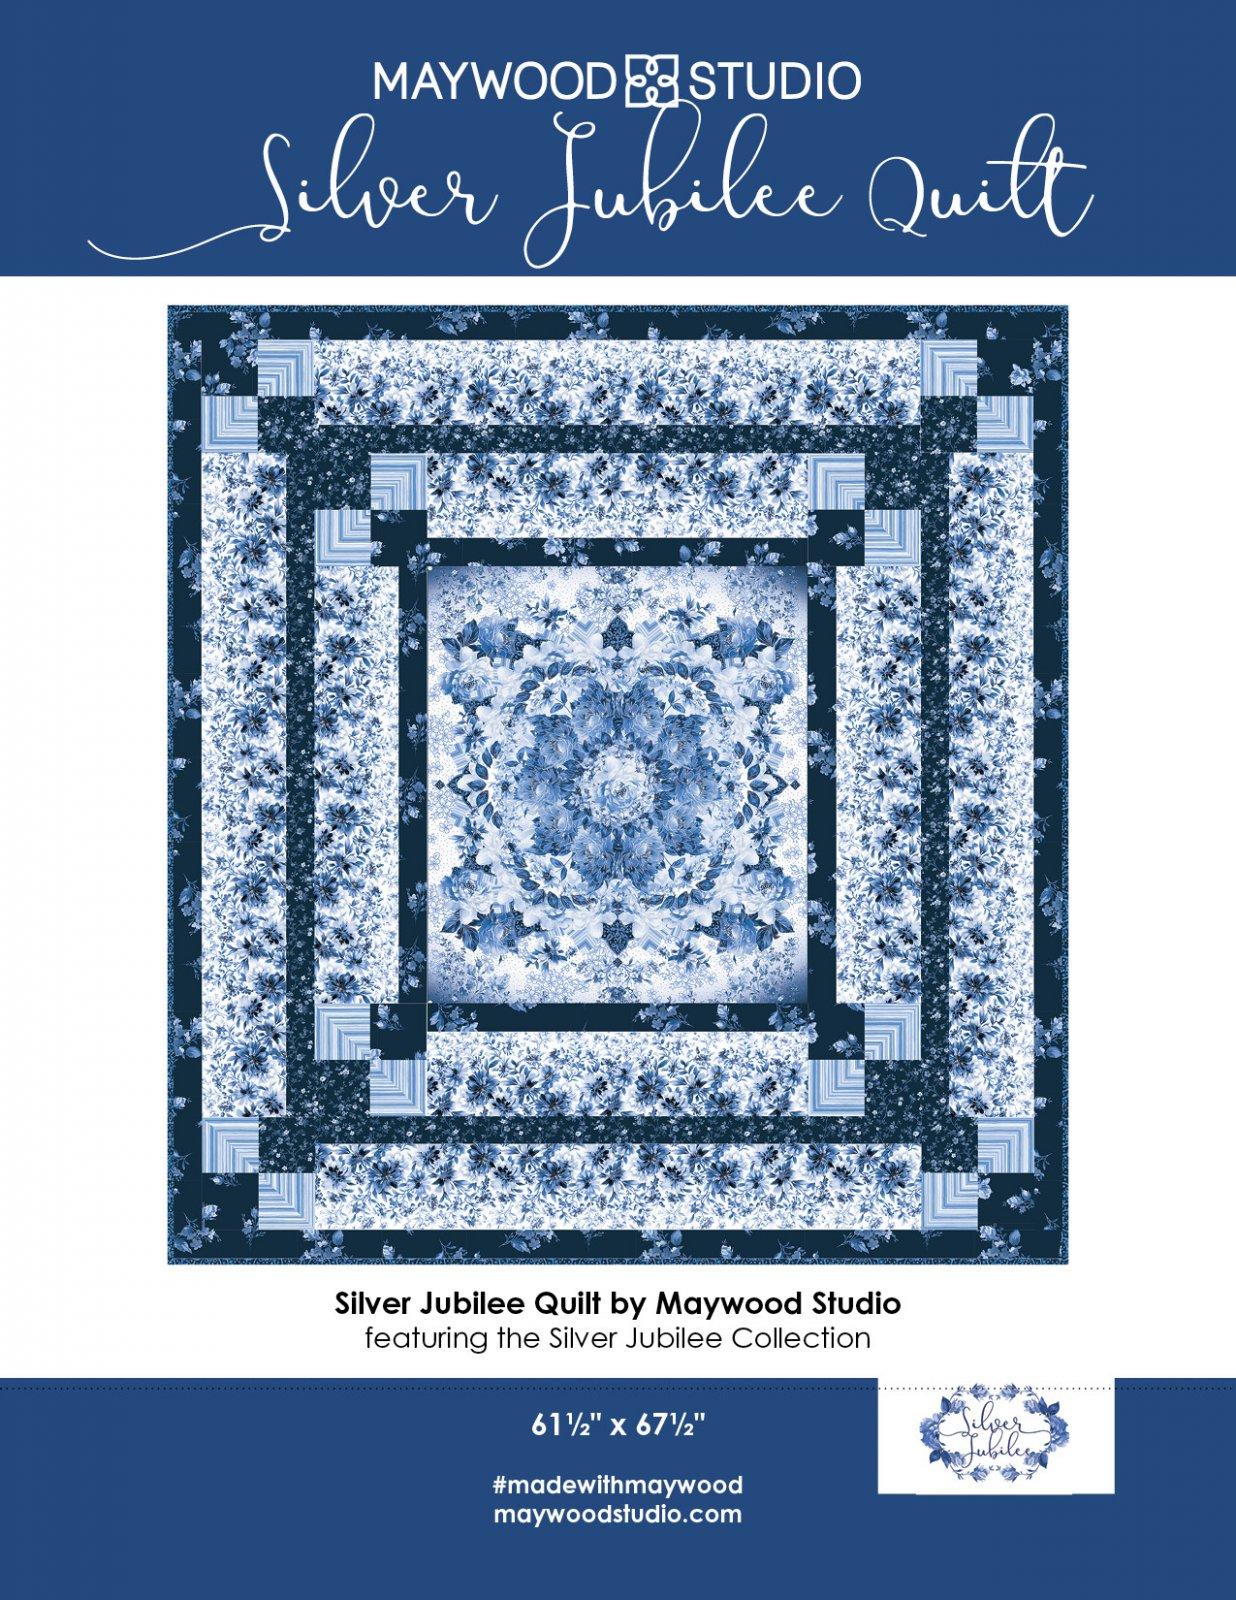 Silver Jubilee Quilt kit by Maywood Studio KIT-MASSIJ